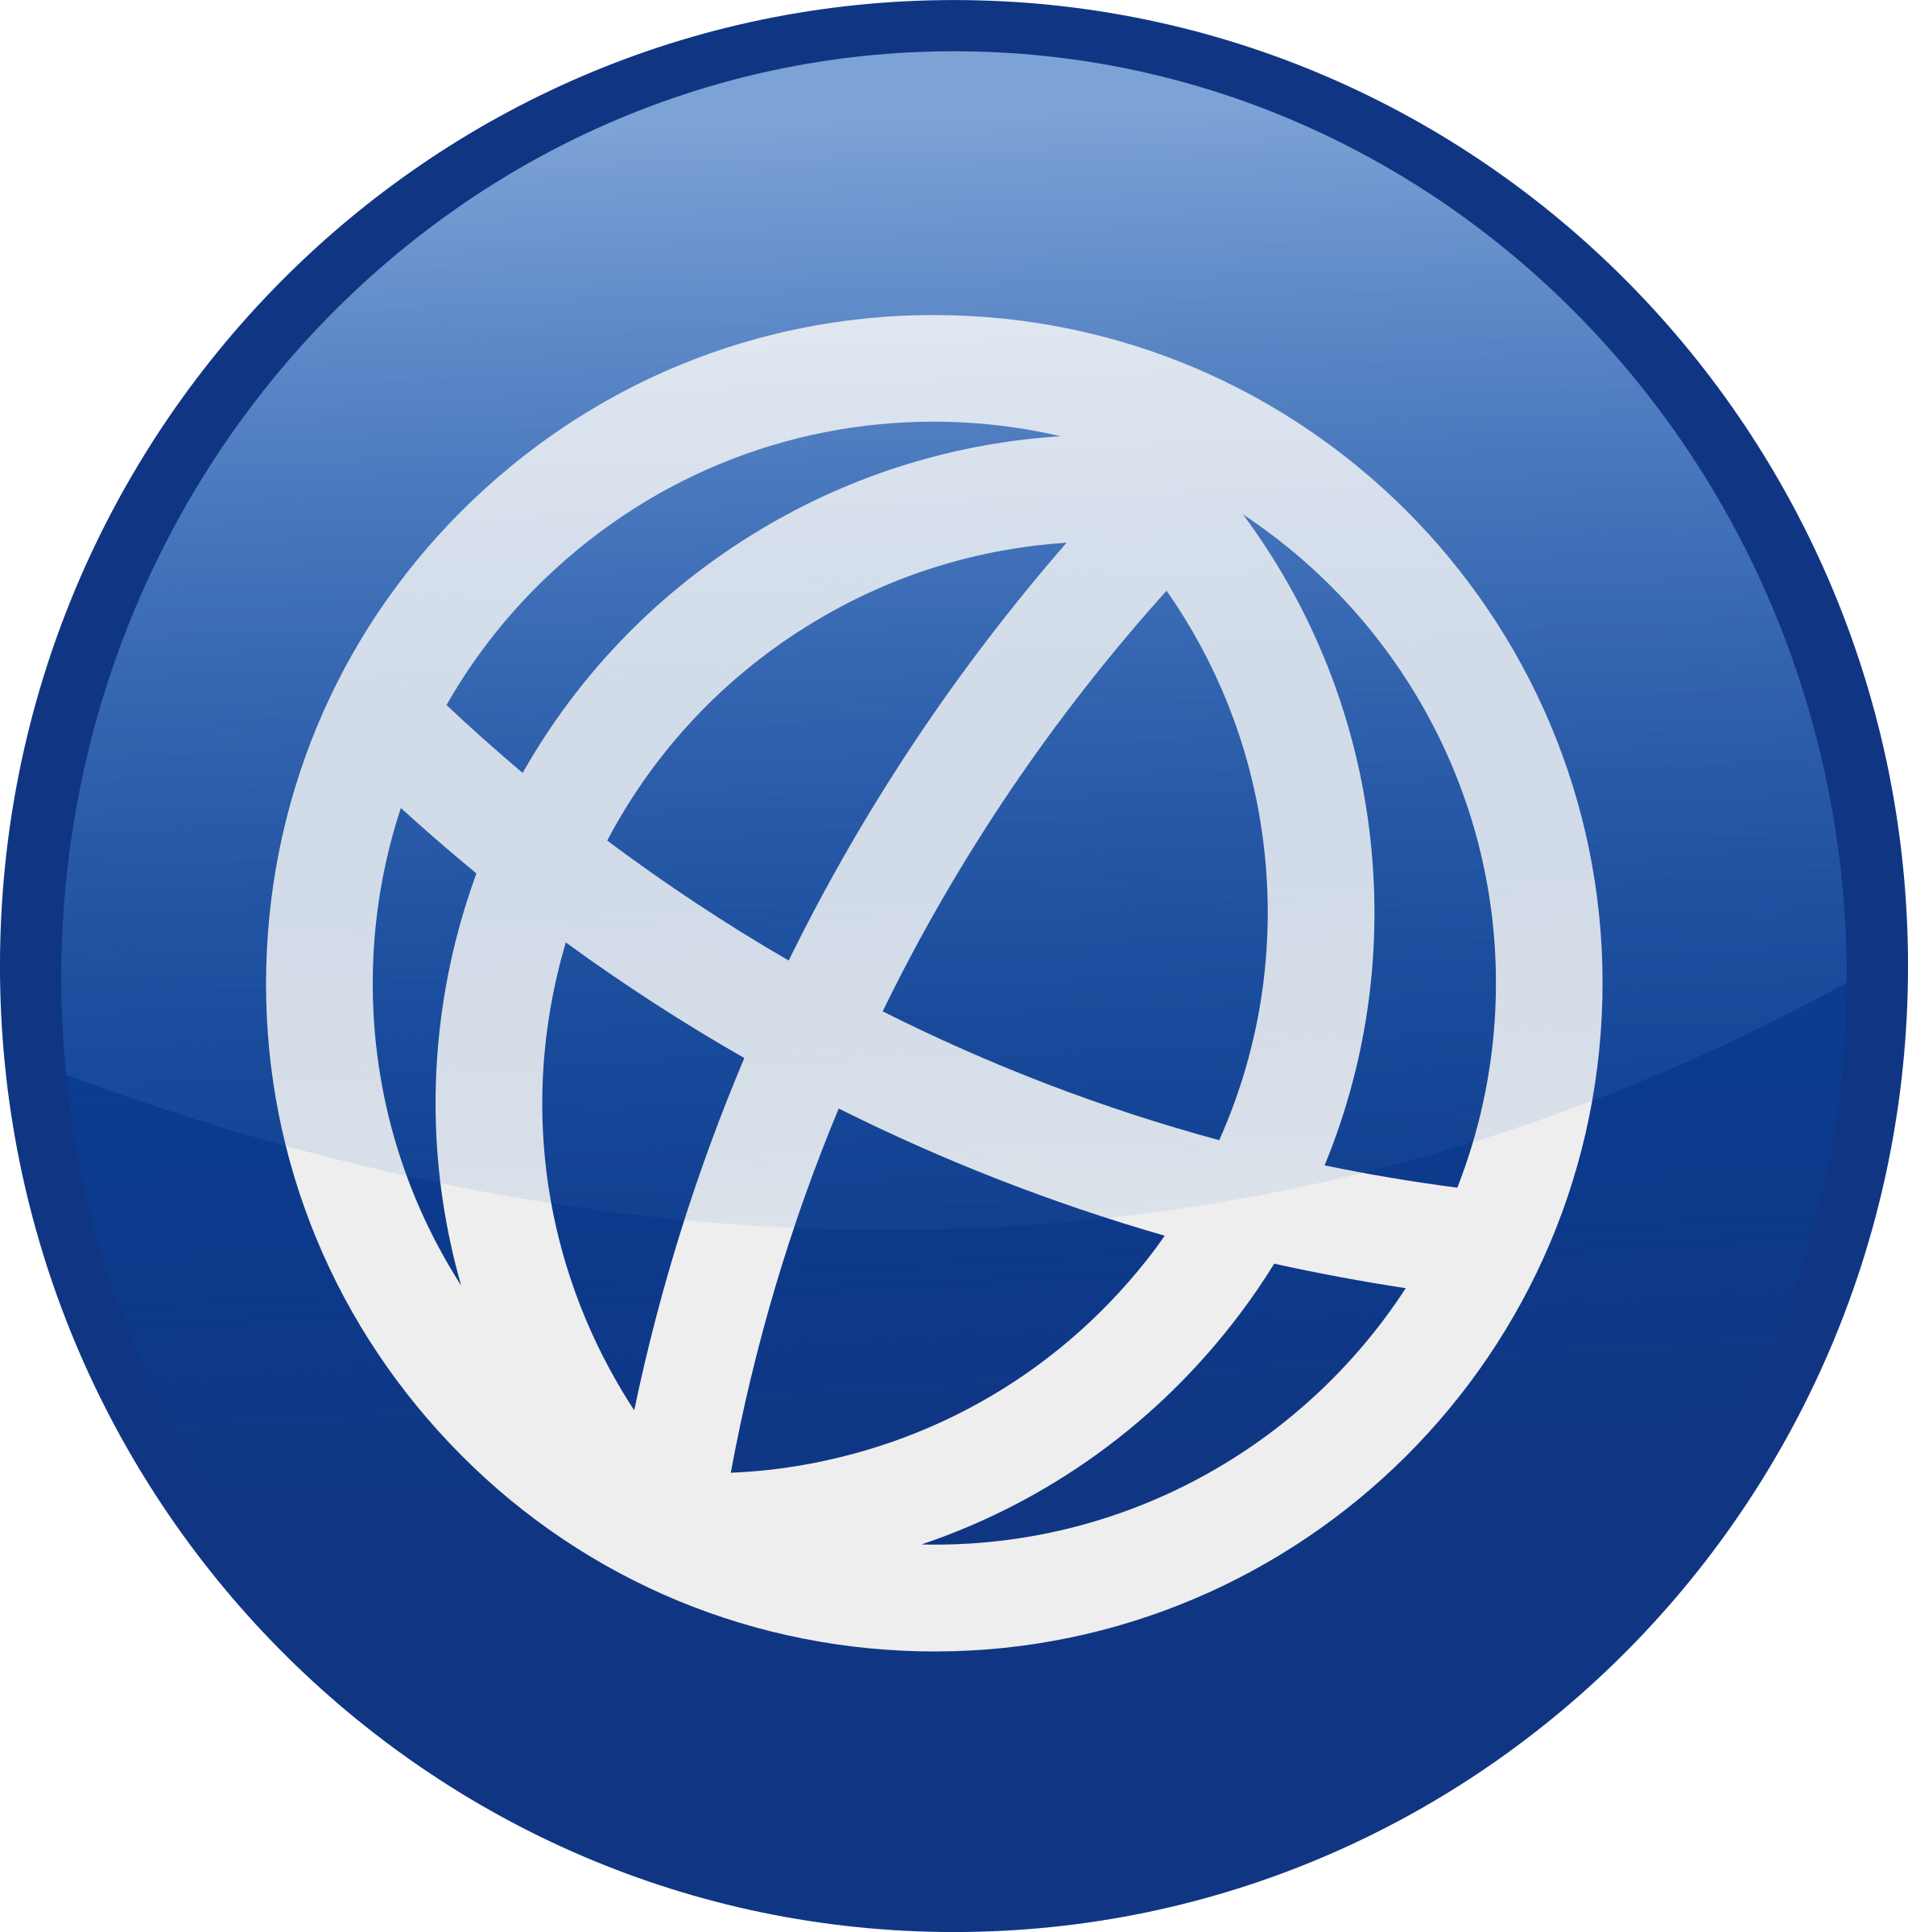 Globe blue big image. Website clipart web icon